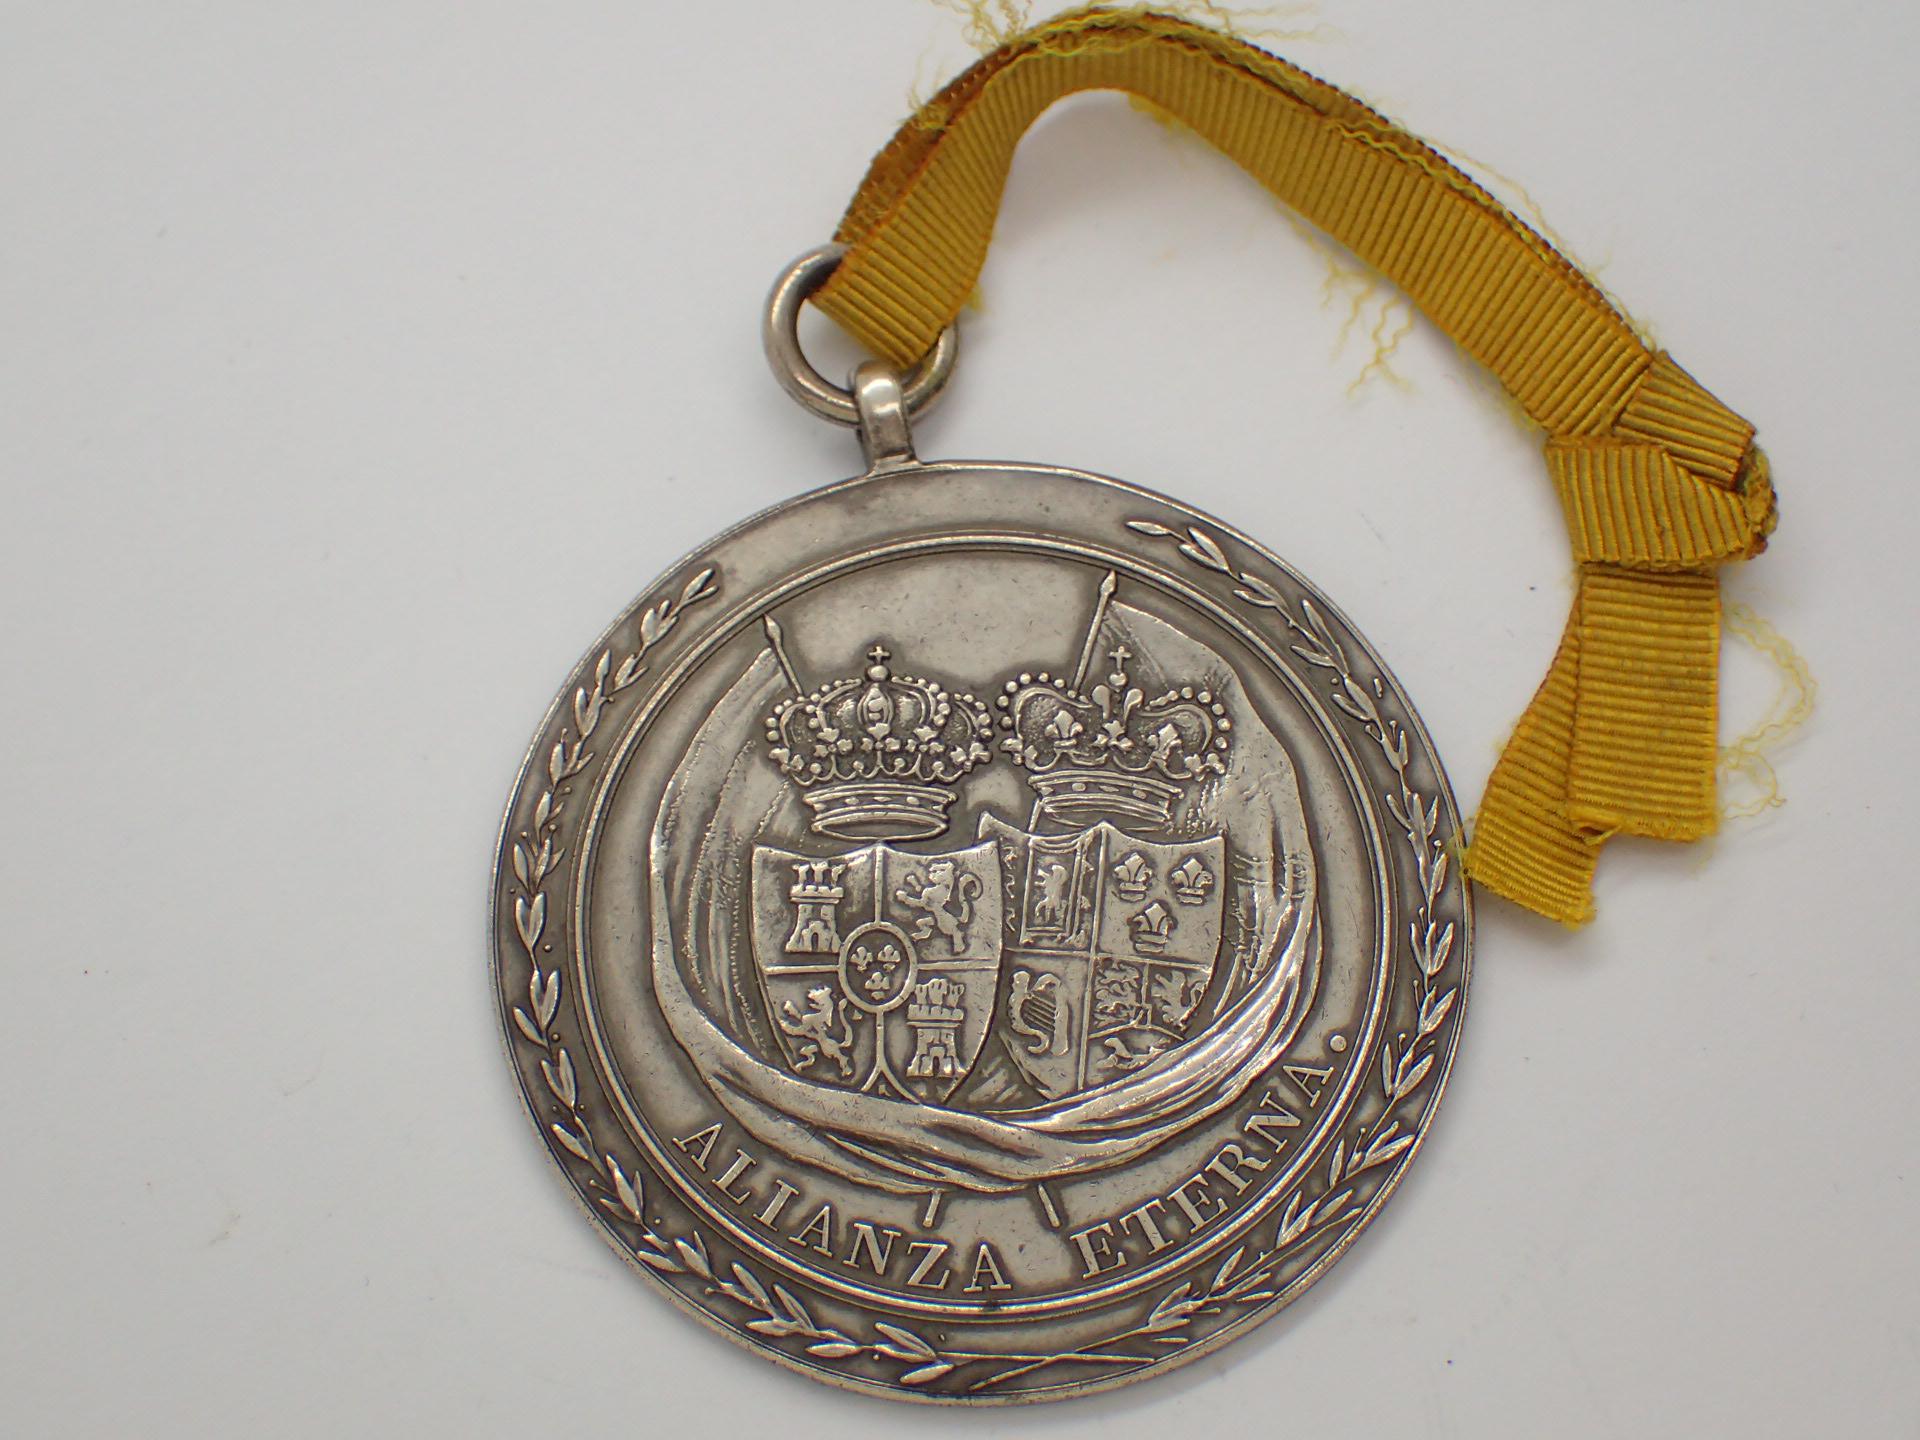 Lot 82 - Bagur and Palamos medal 1811 Spain award